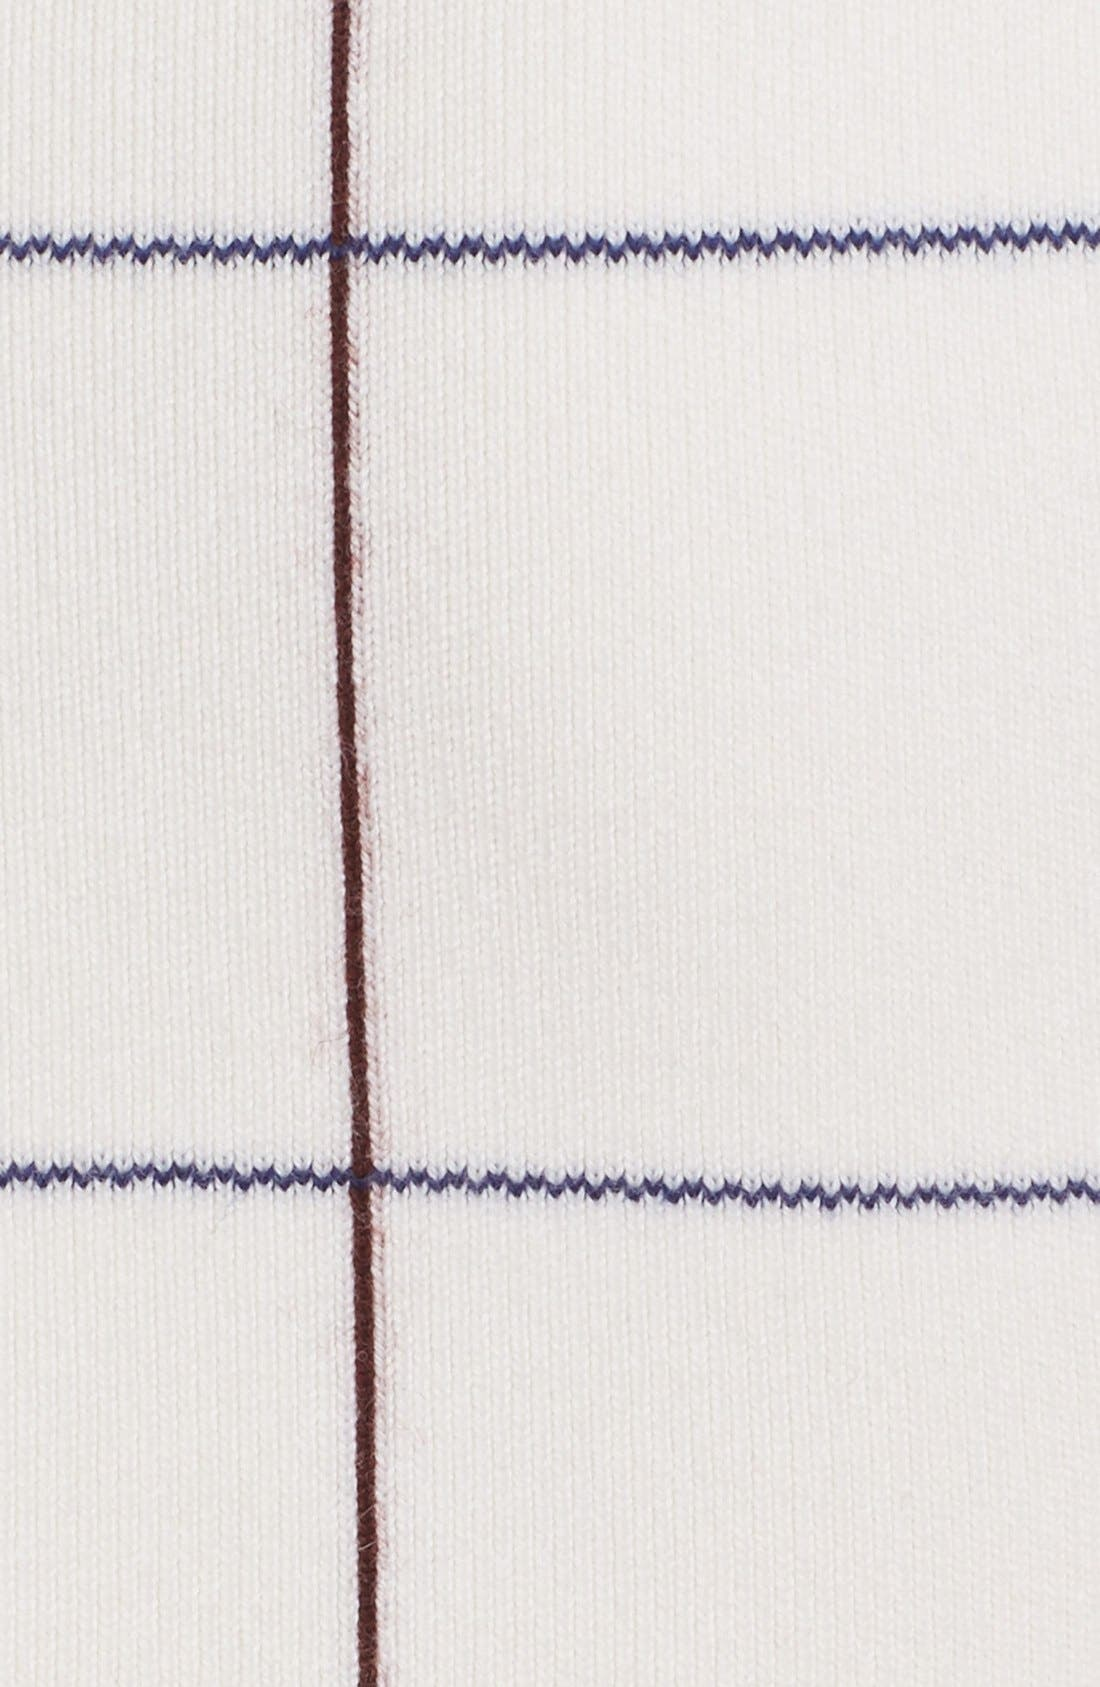 Victoria Beckham Intarsia Check Sheath Dress,                             Alternate thumbnail 3, color,                             100